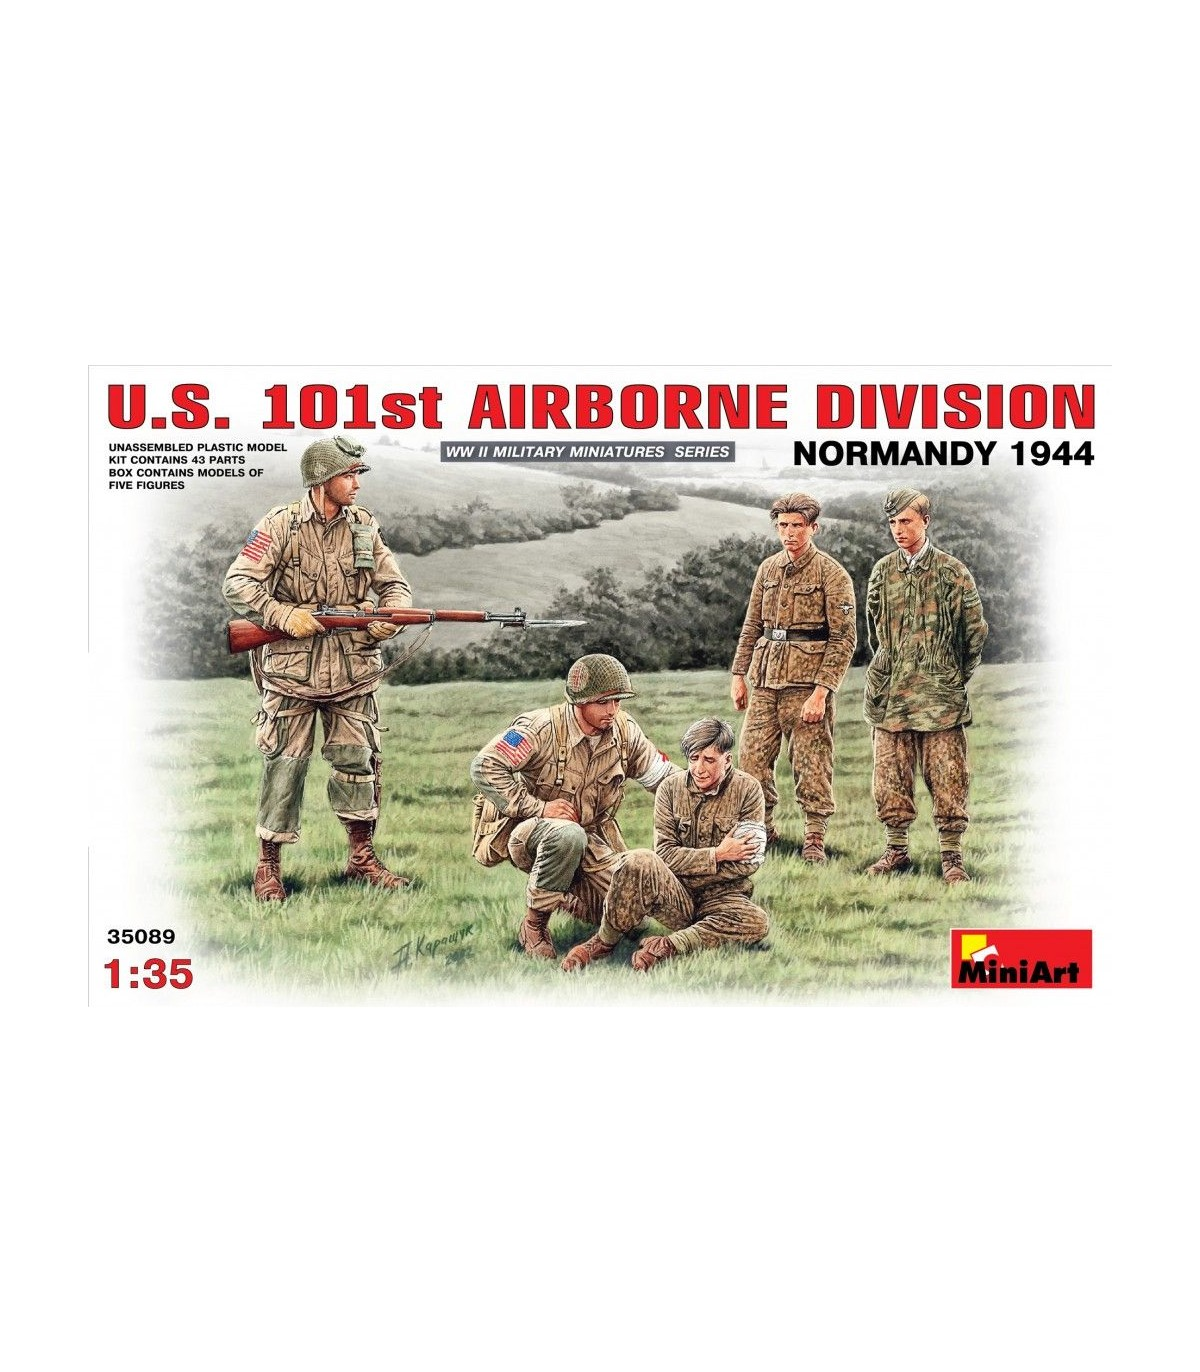 35089 U S 101st Airborne Division Normandy 1944